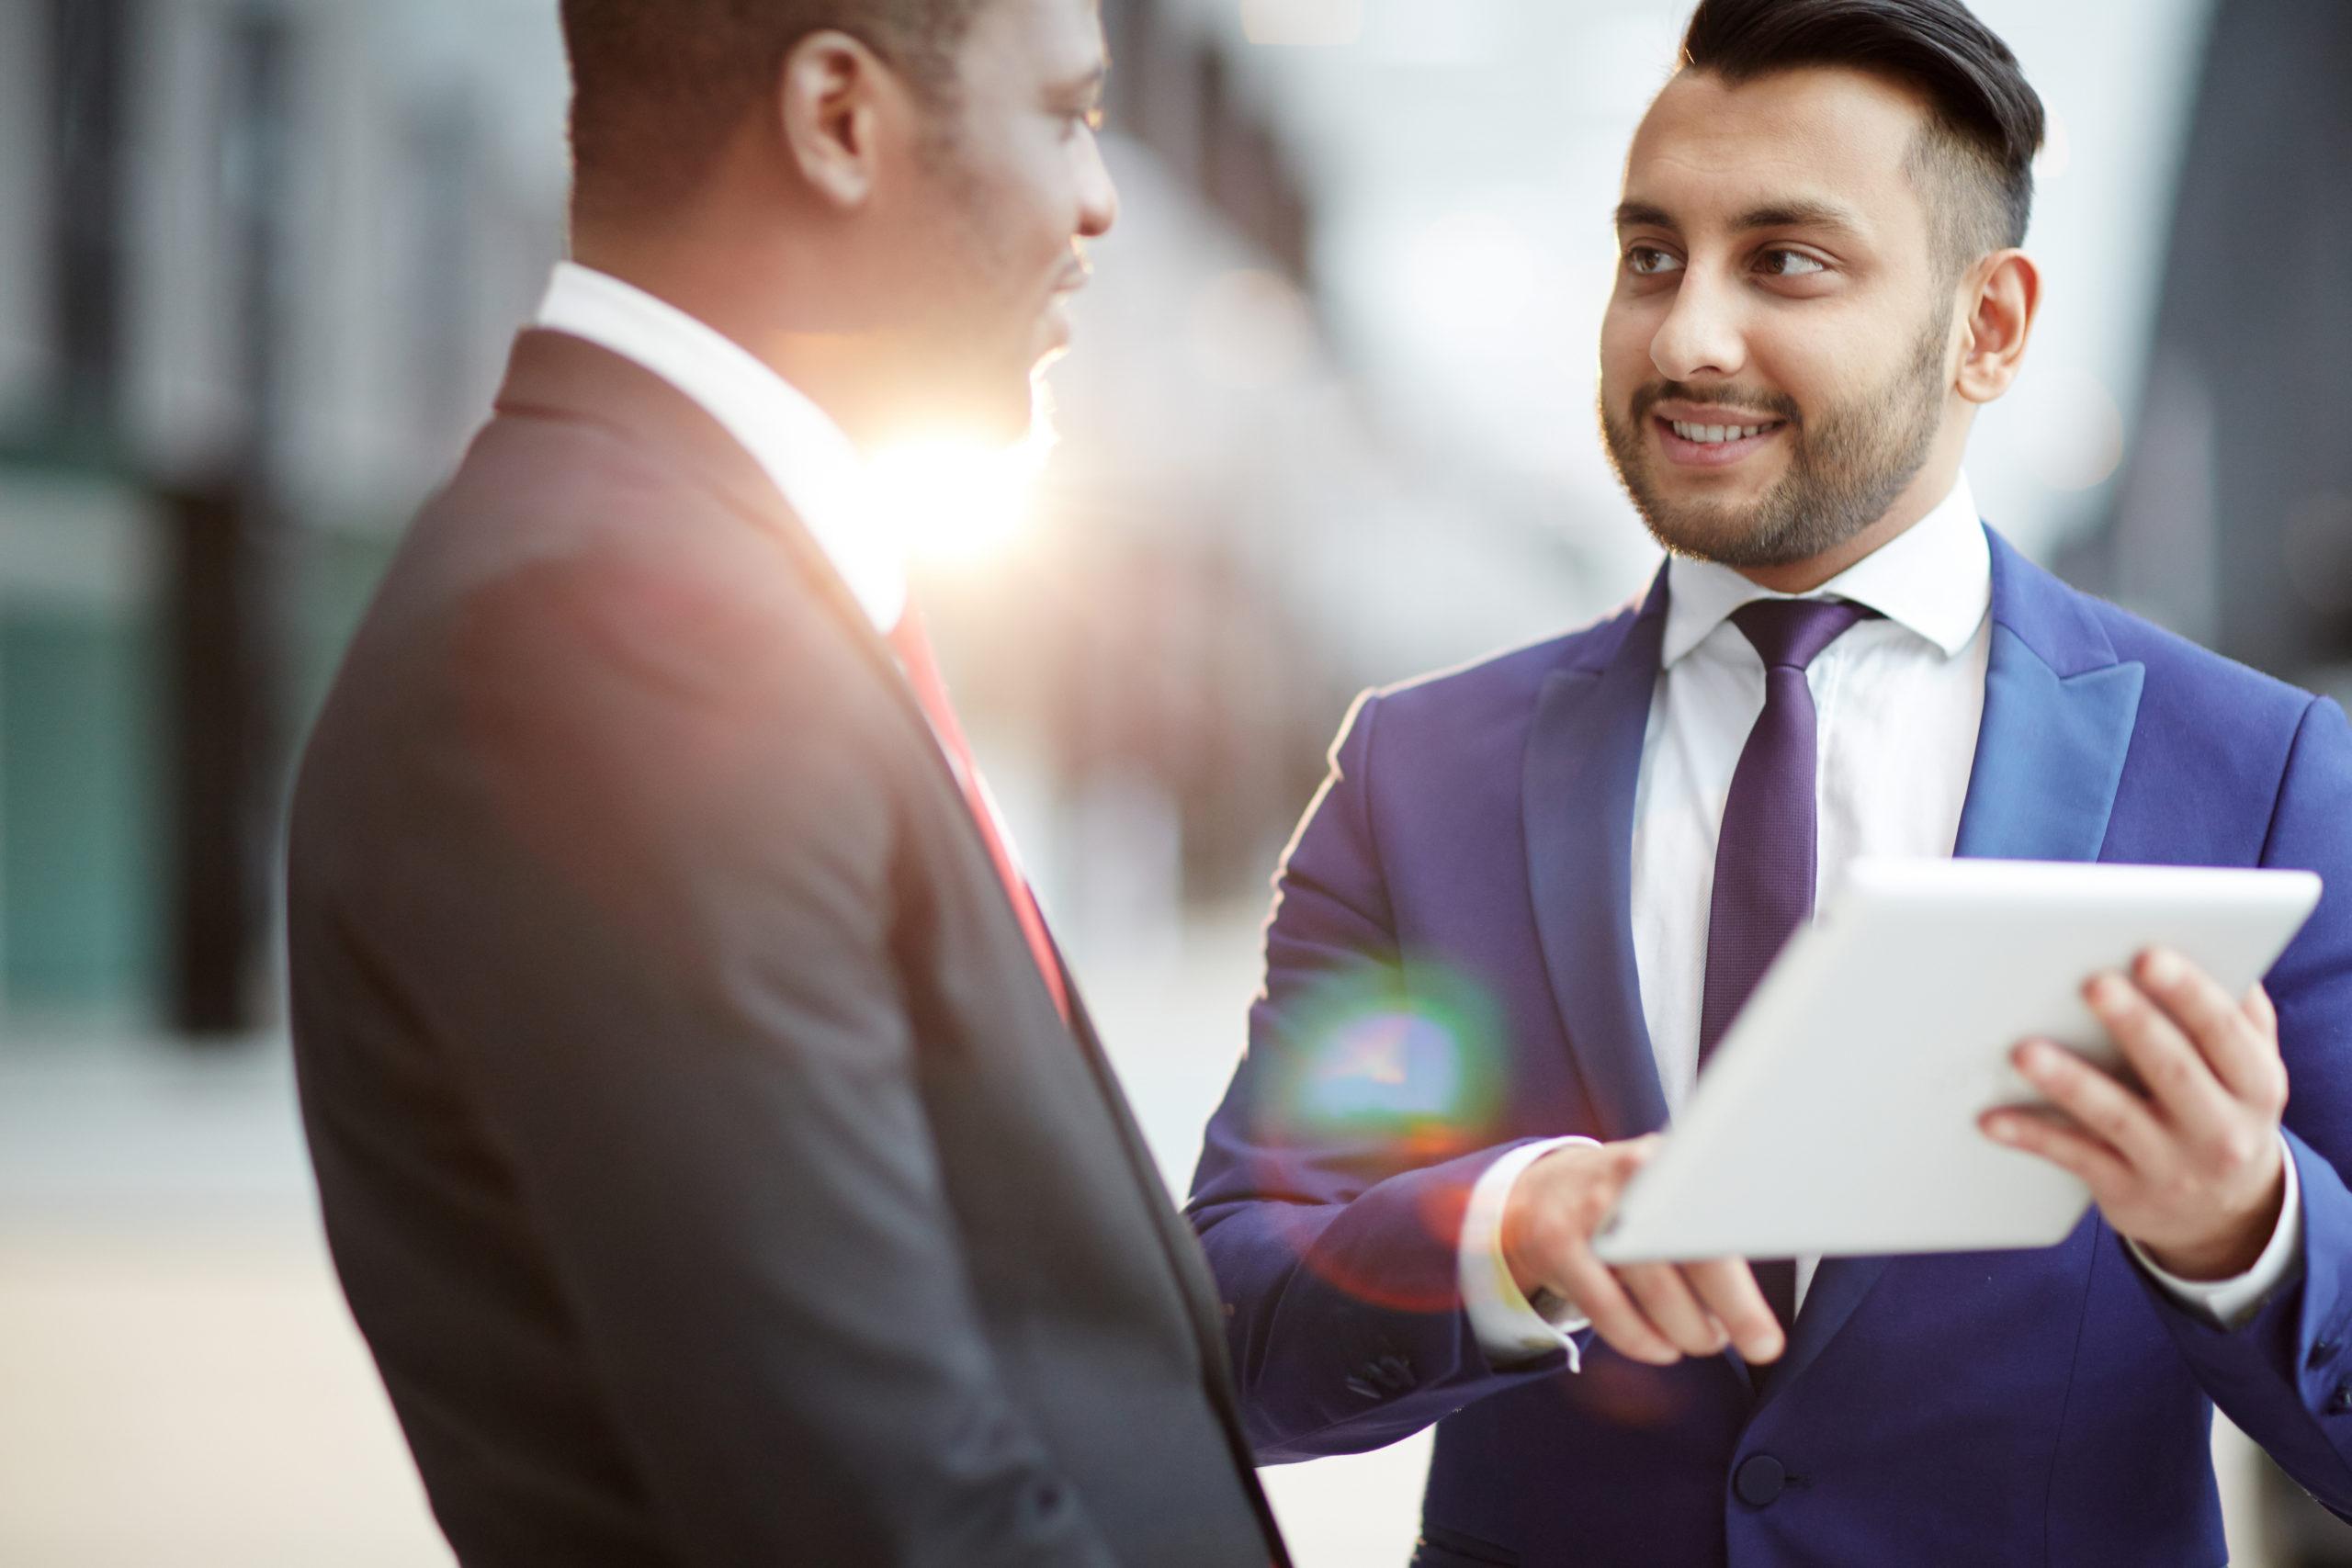 Executive Leadership Podcast #94: Change Agents – Talking Change or Making Change